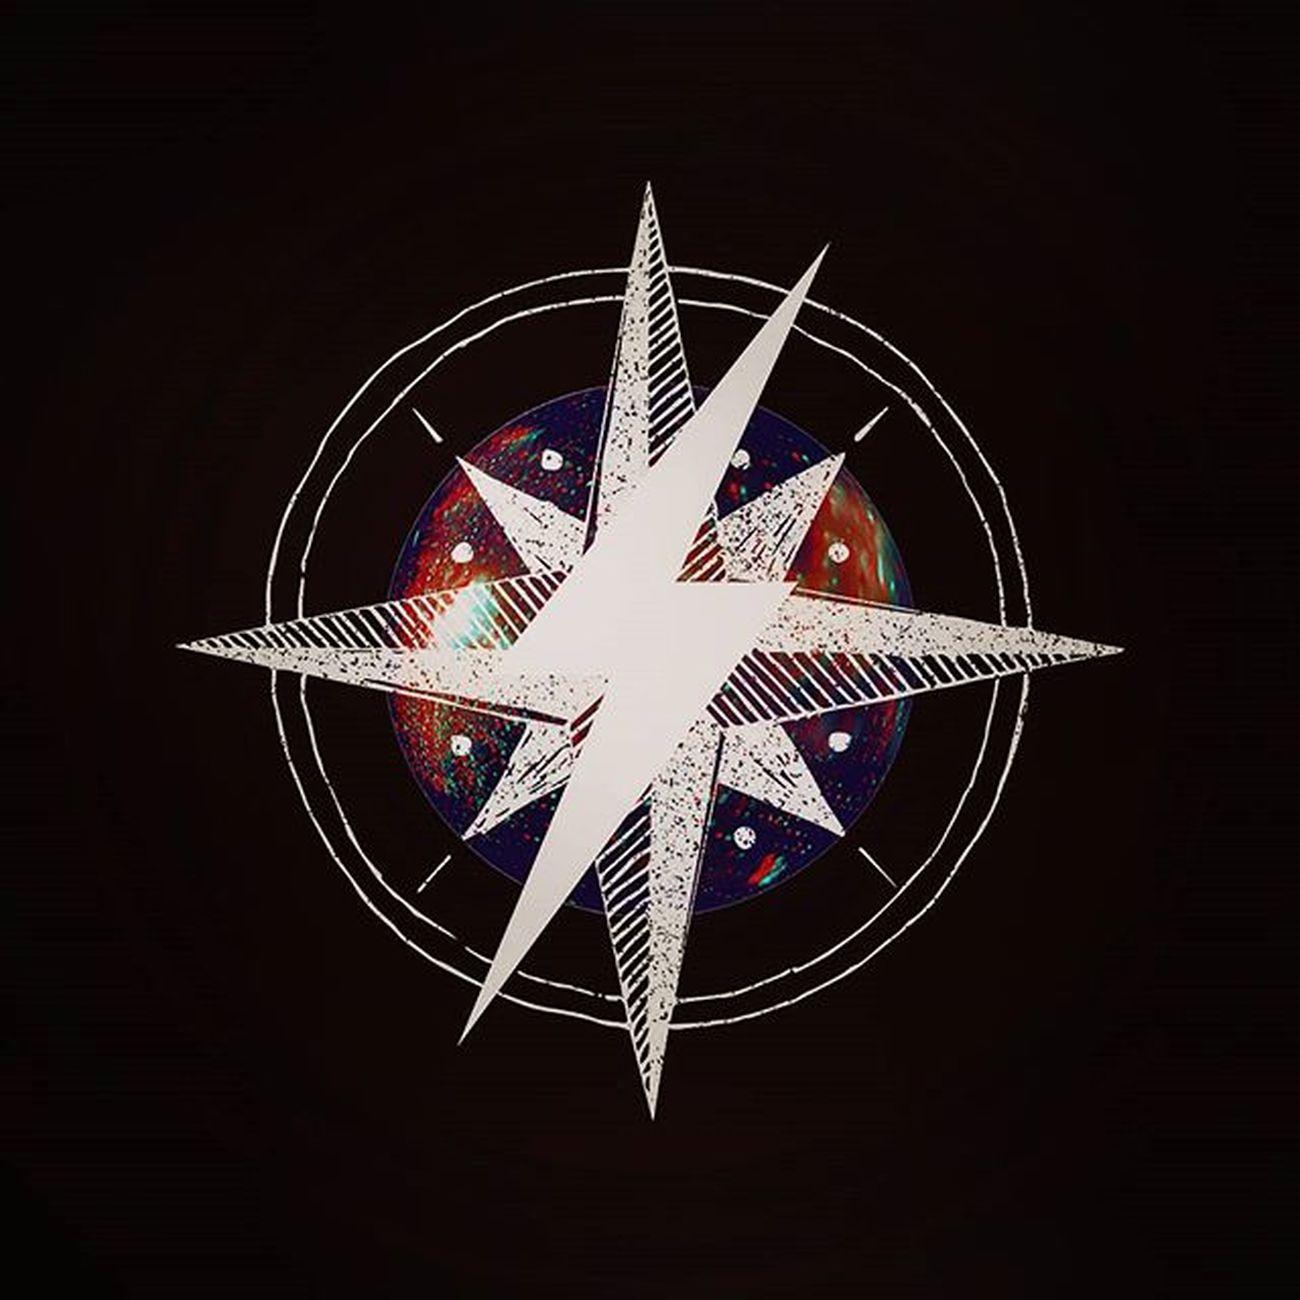 Universo Mundo Infinito Galaxia F4F Followme Luz Oscuridad Dkaeghn2275 @dkaeghn2275 🇩🇰🇦🇪🇬🇭🇳2275